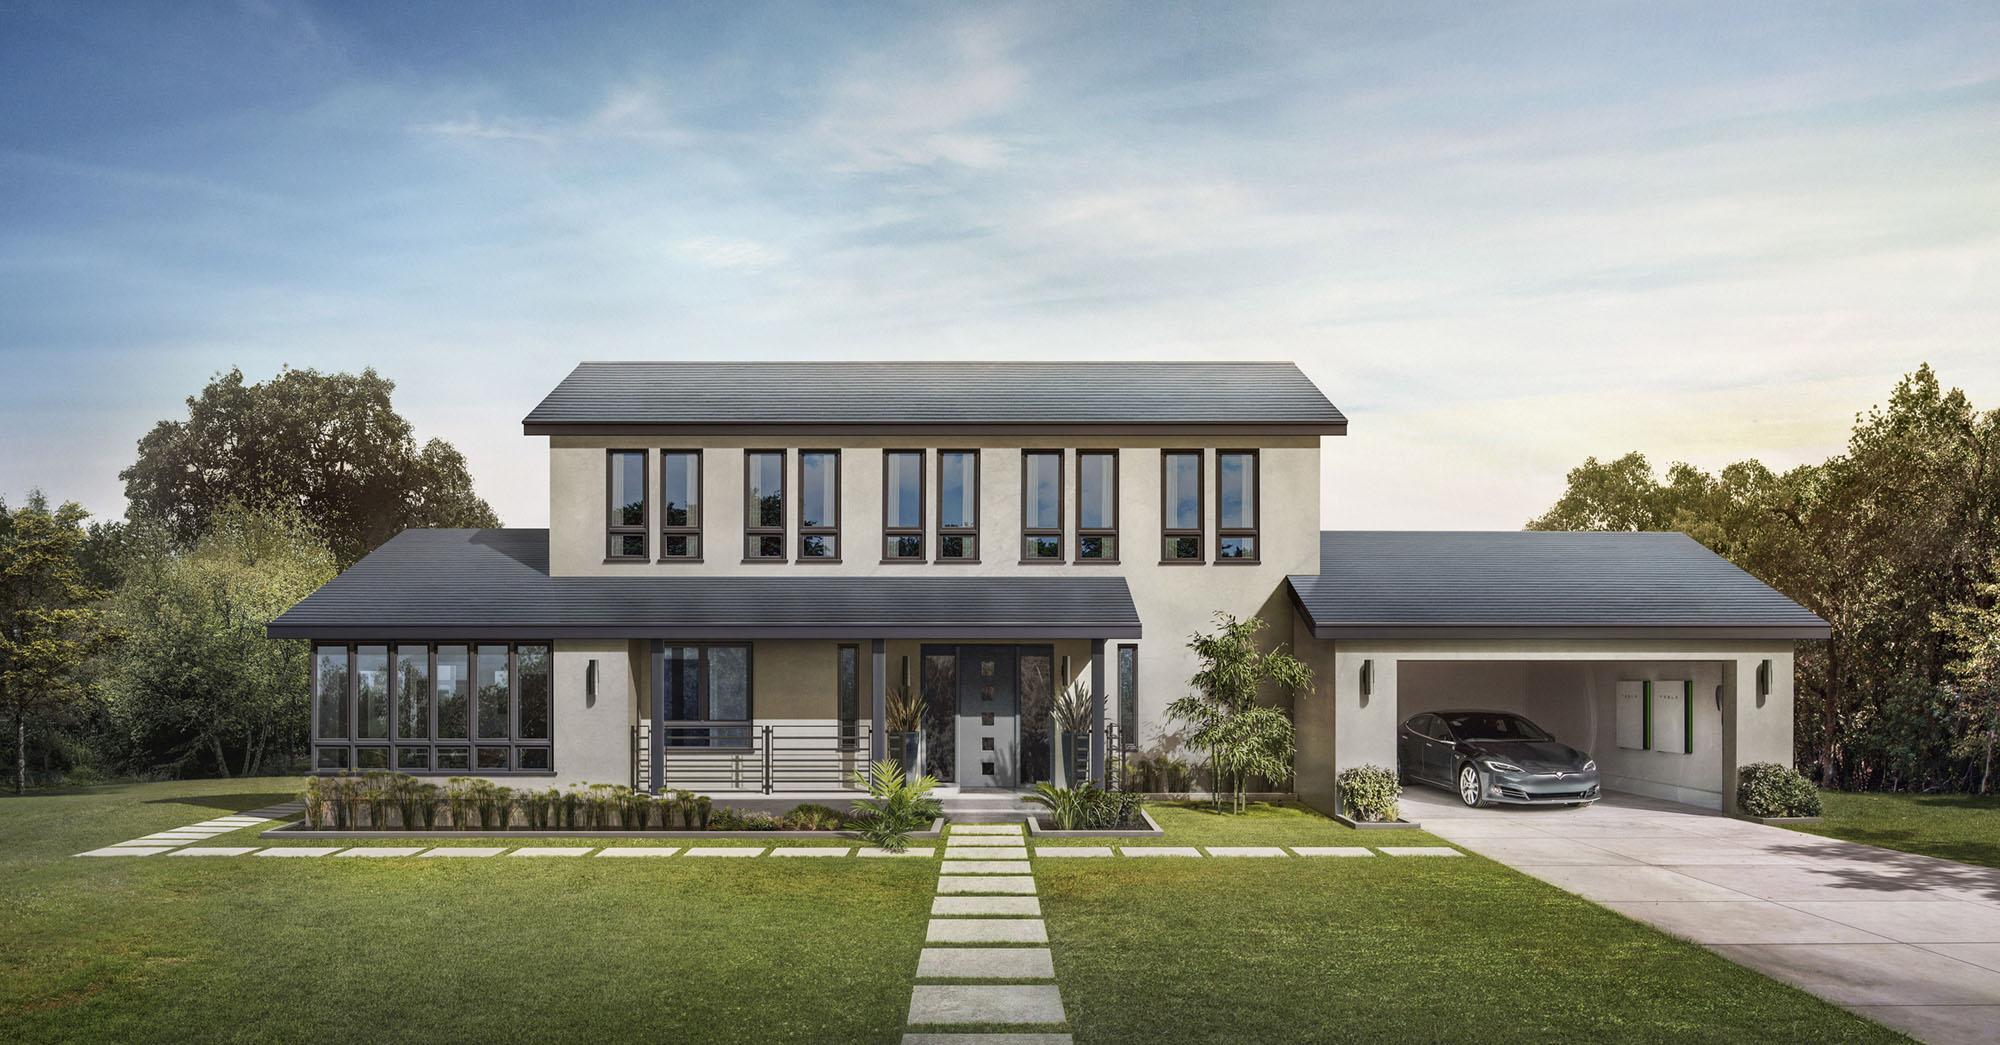 tesla-solar-roof-smooth-glass.jpg